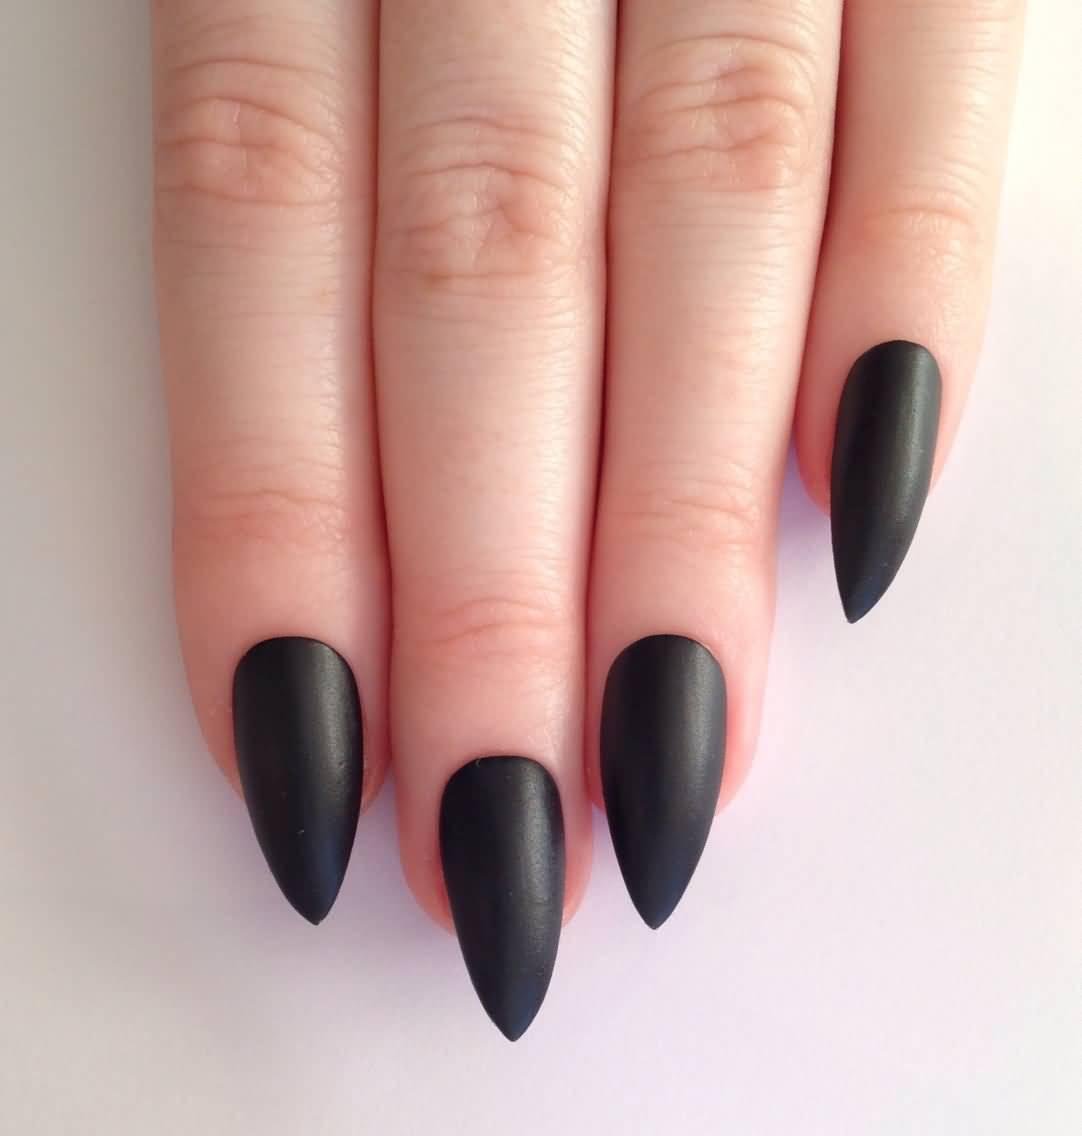 Fabulous Black Nail Art With Sharp Nail Design